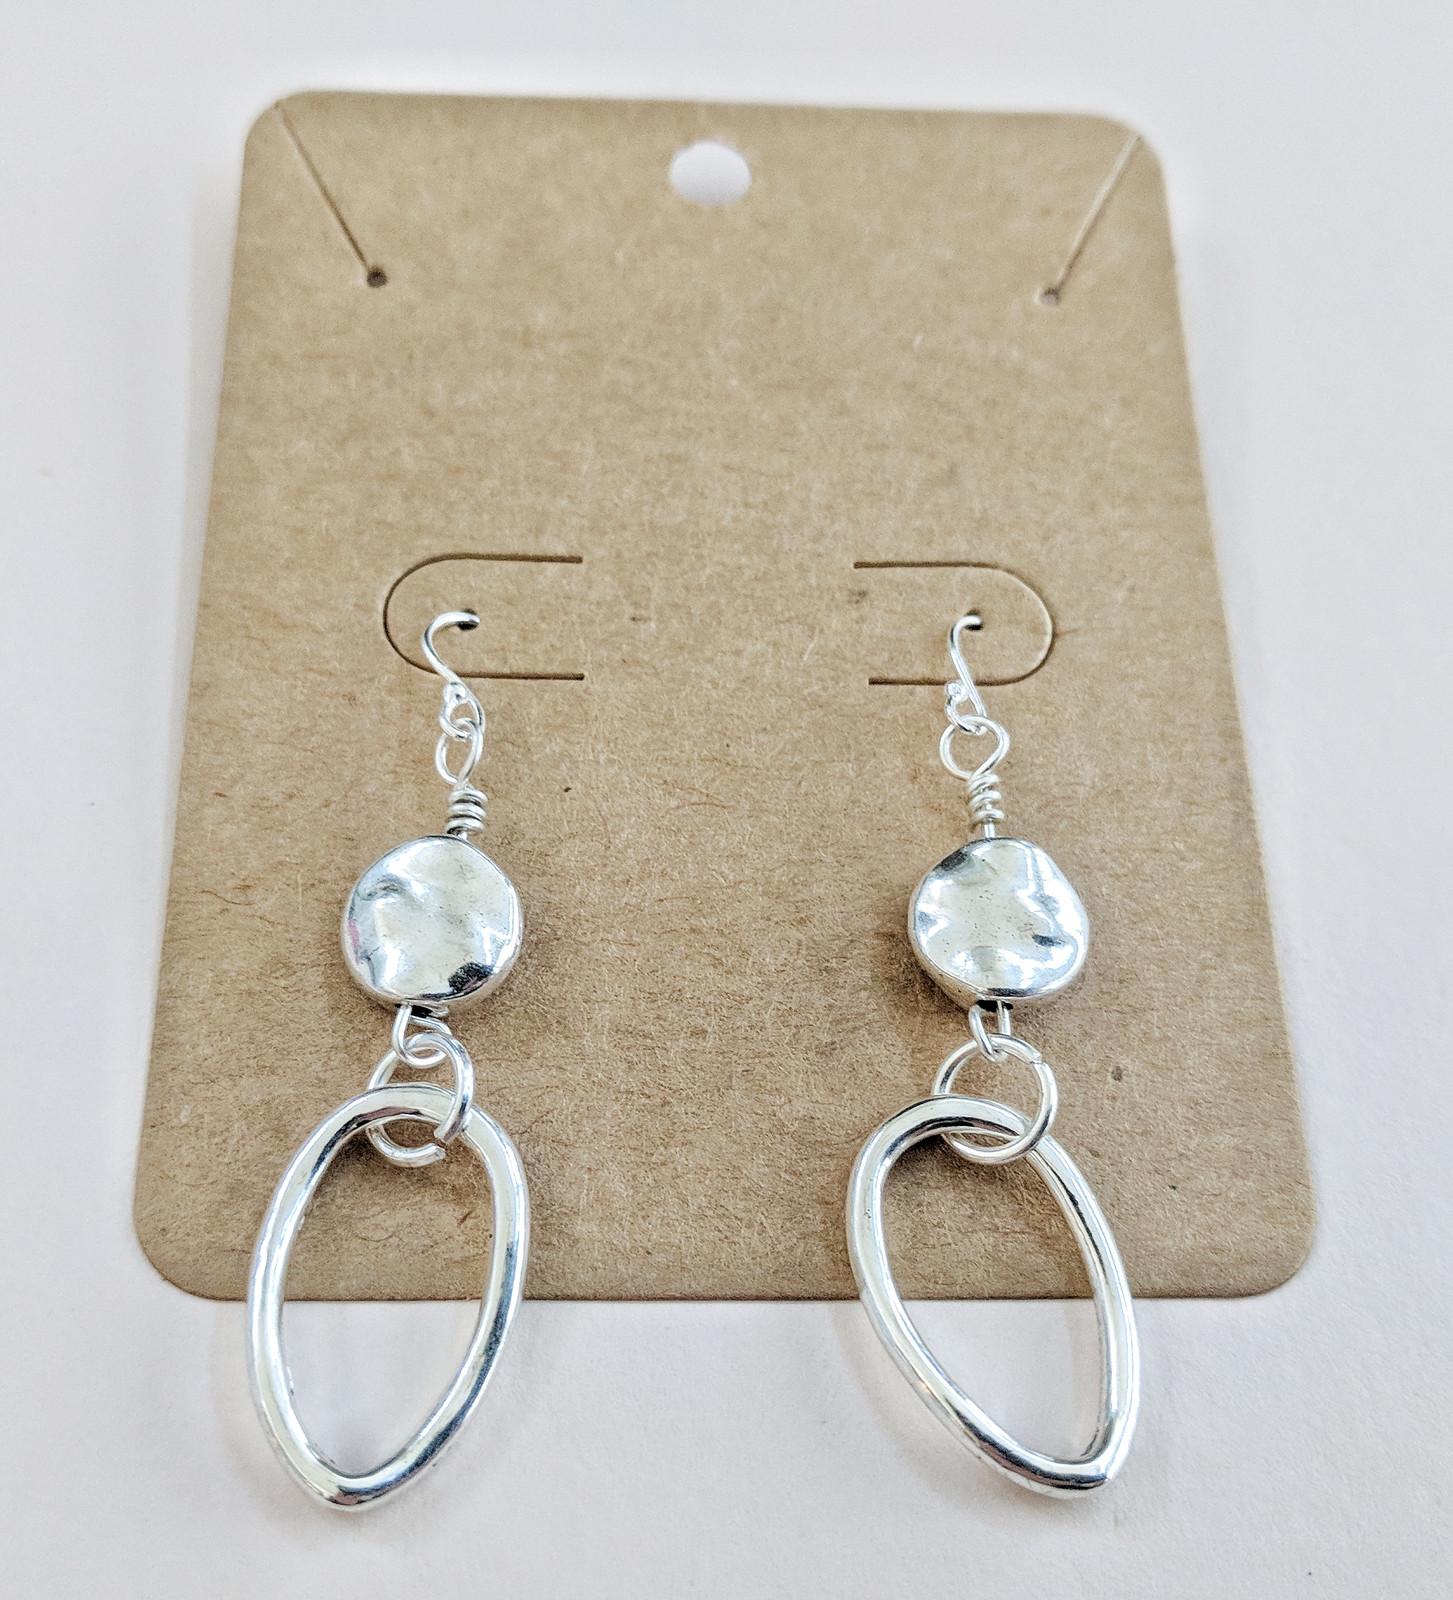 E0009 Silver Coin with Oval Hoop Earrings | Custom handmade jewelry ...